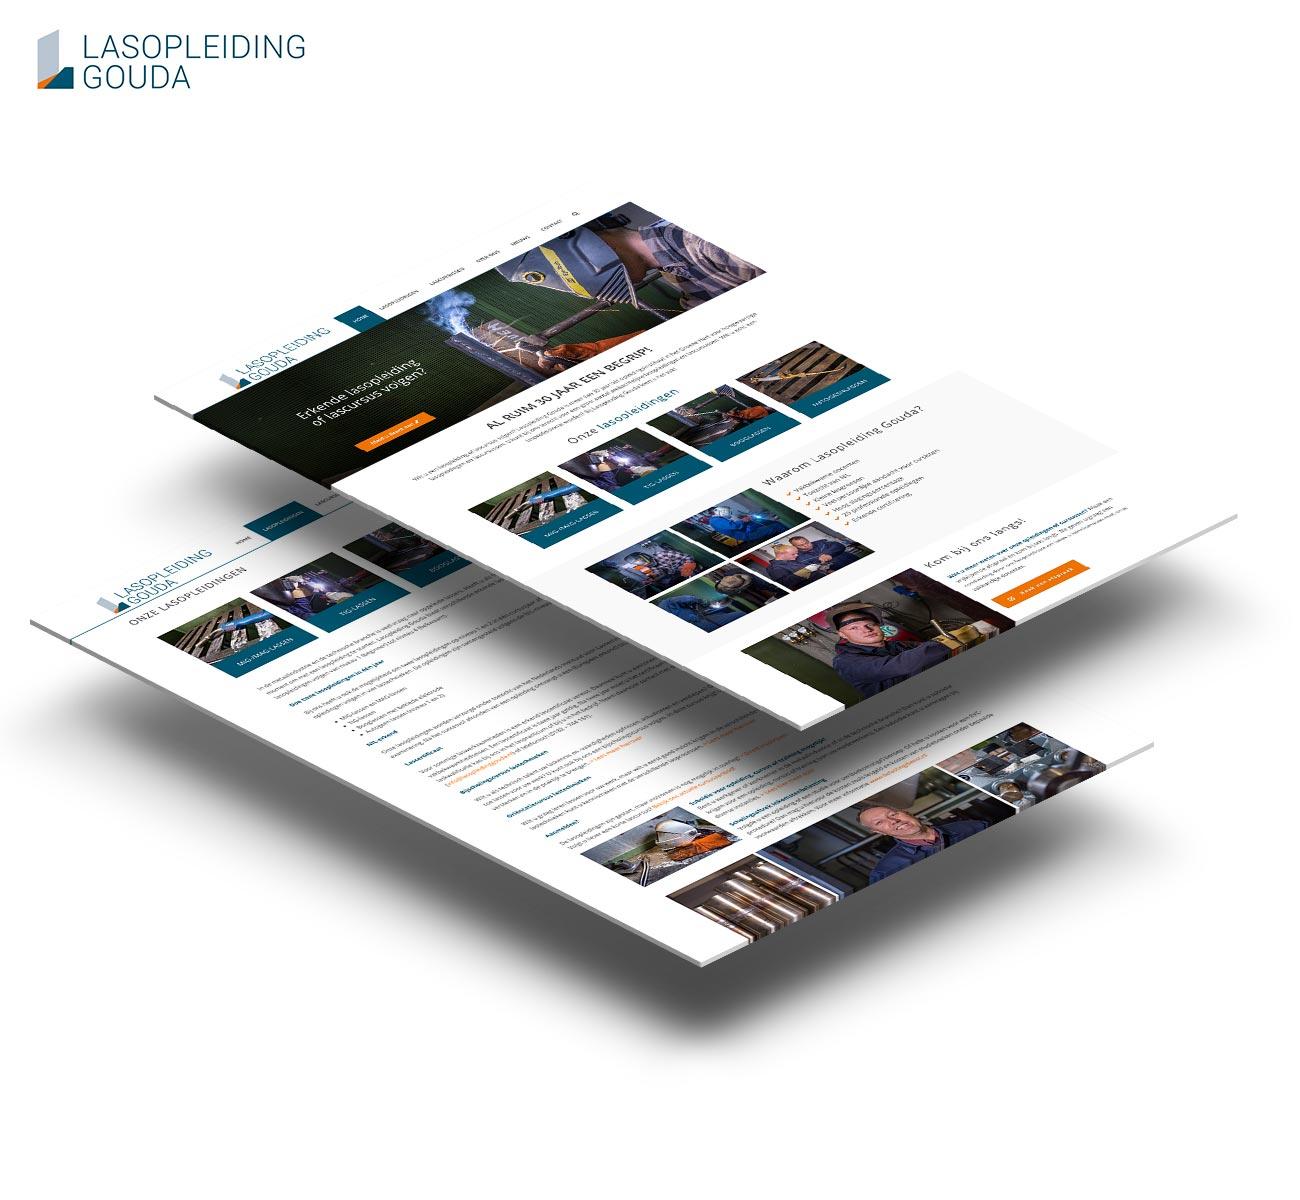 Lasopleiding Gouda Website